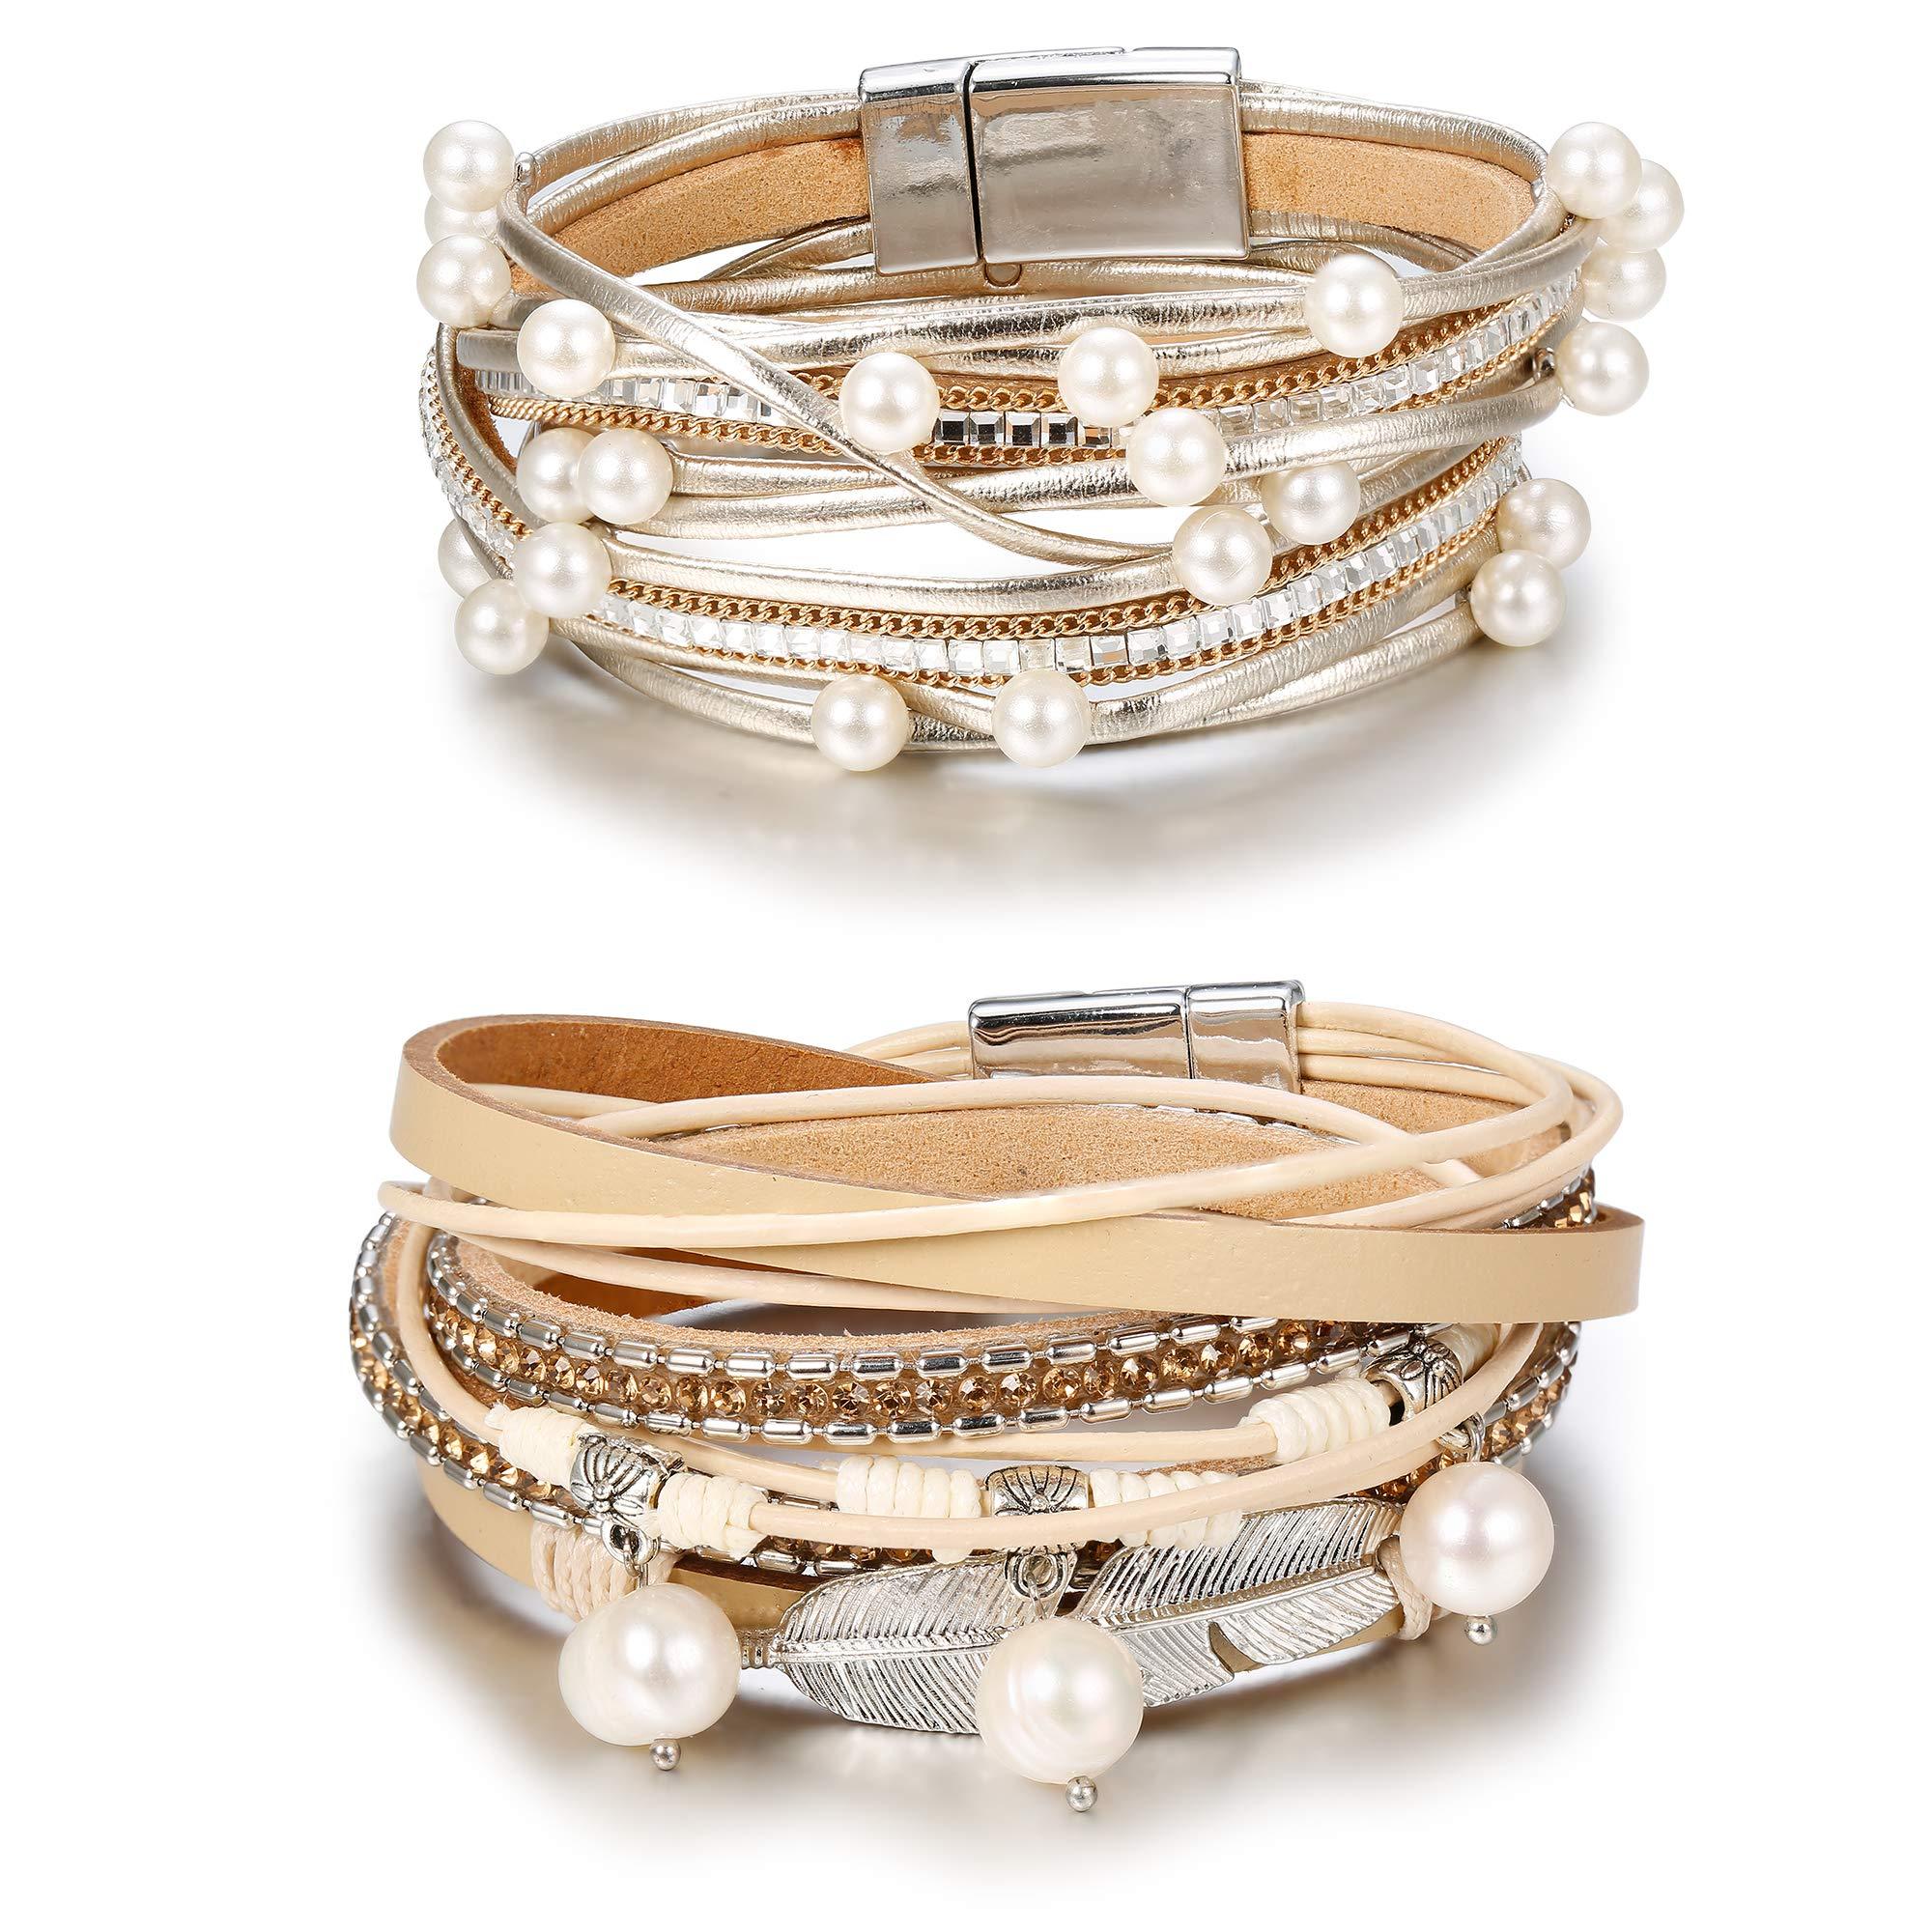 Hanpabum 2Pcs Multilayer Leather Wrap Bracelets Women Girls Boho Magnetic Clasp Bangle Bracelets Set (A) by Hanpabum